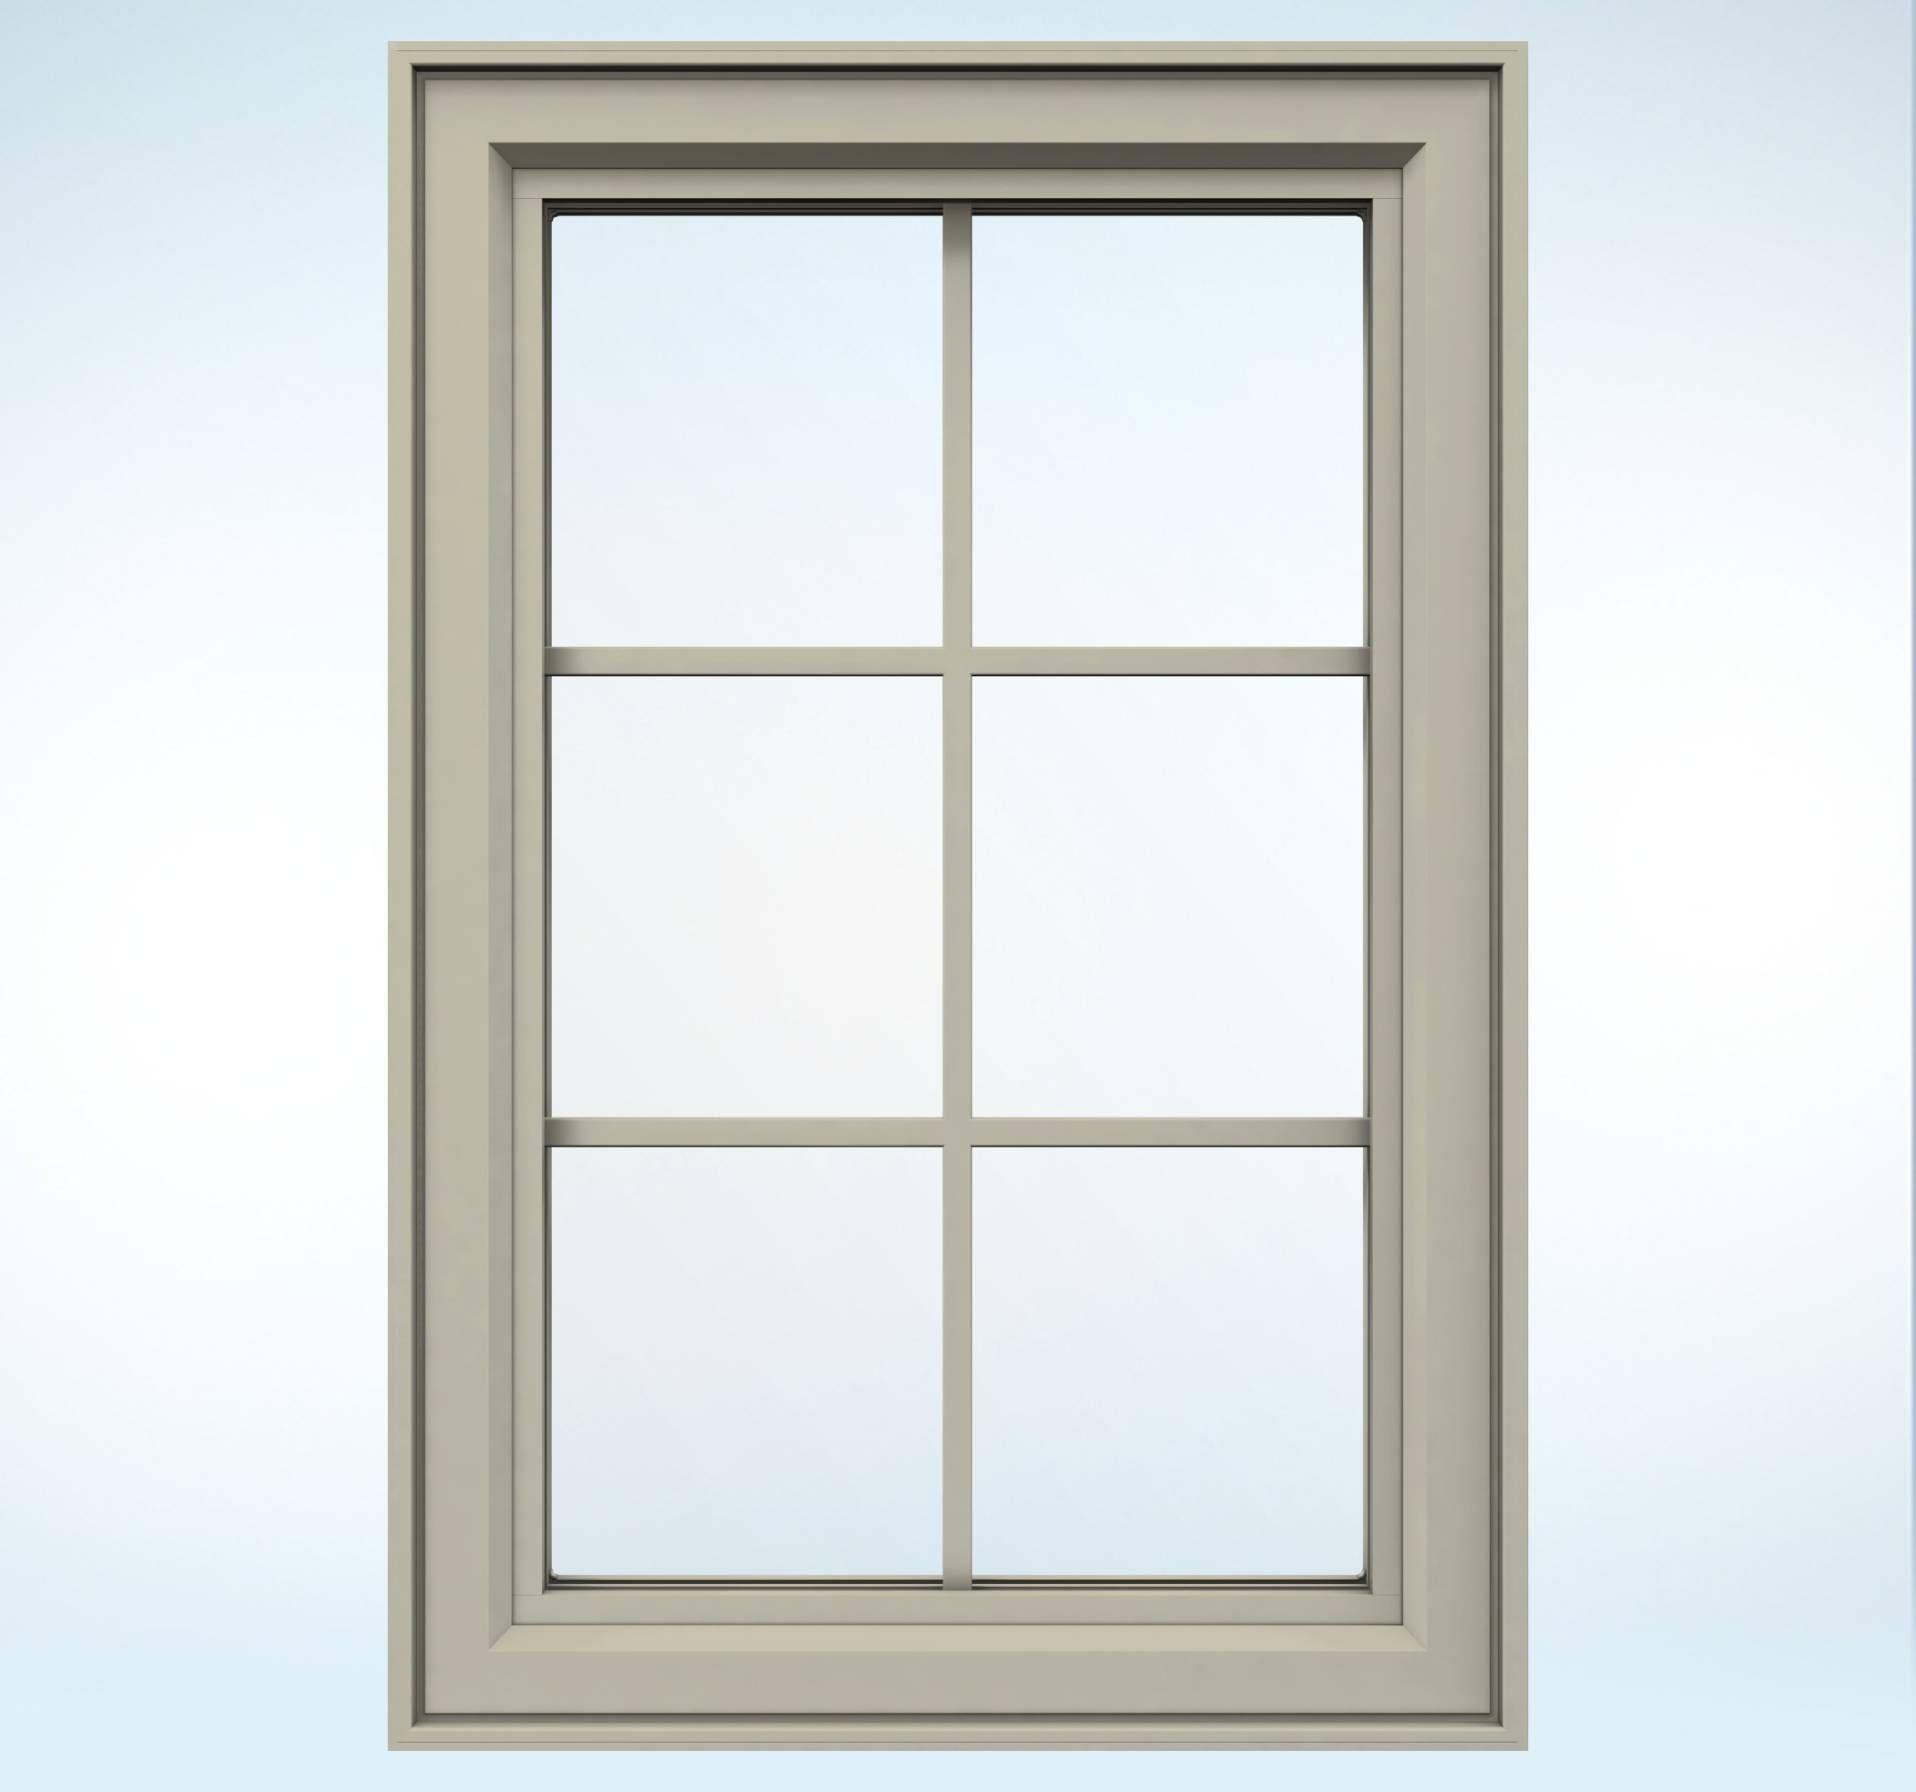 Premium Vinyl V 4500 Jeld Wen Doors Windows Energy Efficient Door Windows Jeld Wen Doors